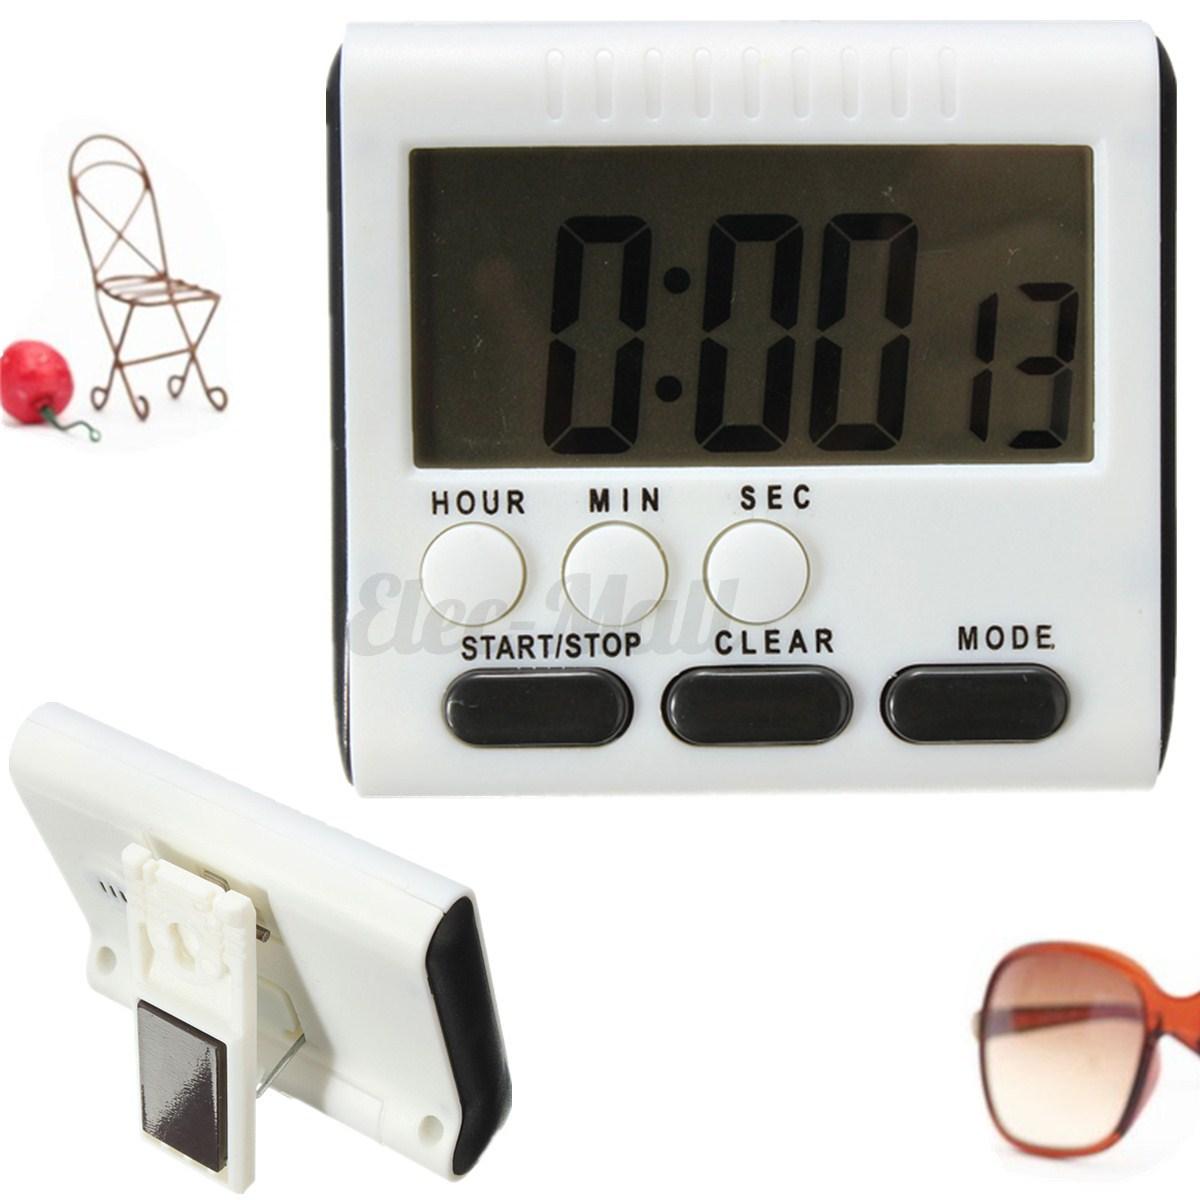 Lcd minuterie minuteur timer compteur electronique - Minuteur electronique cuisine ...